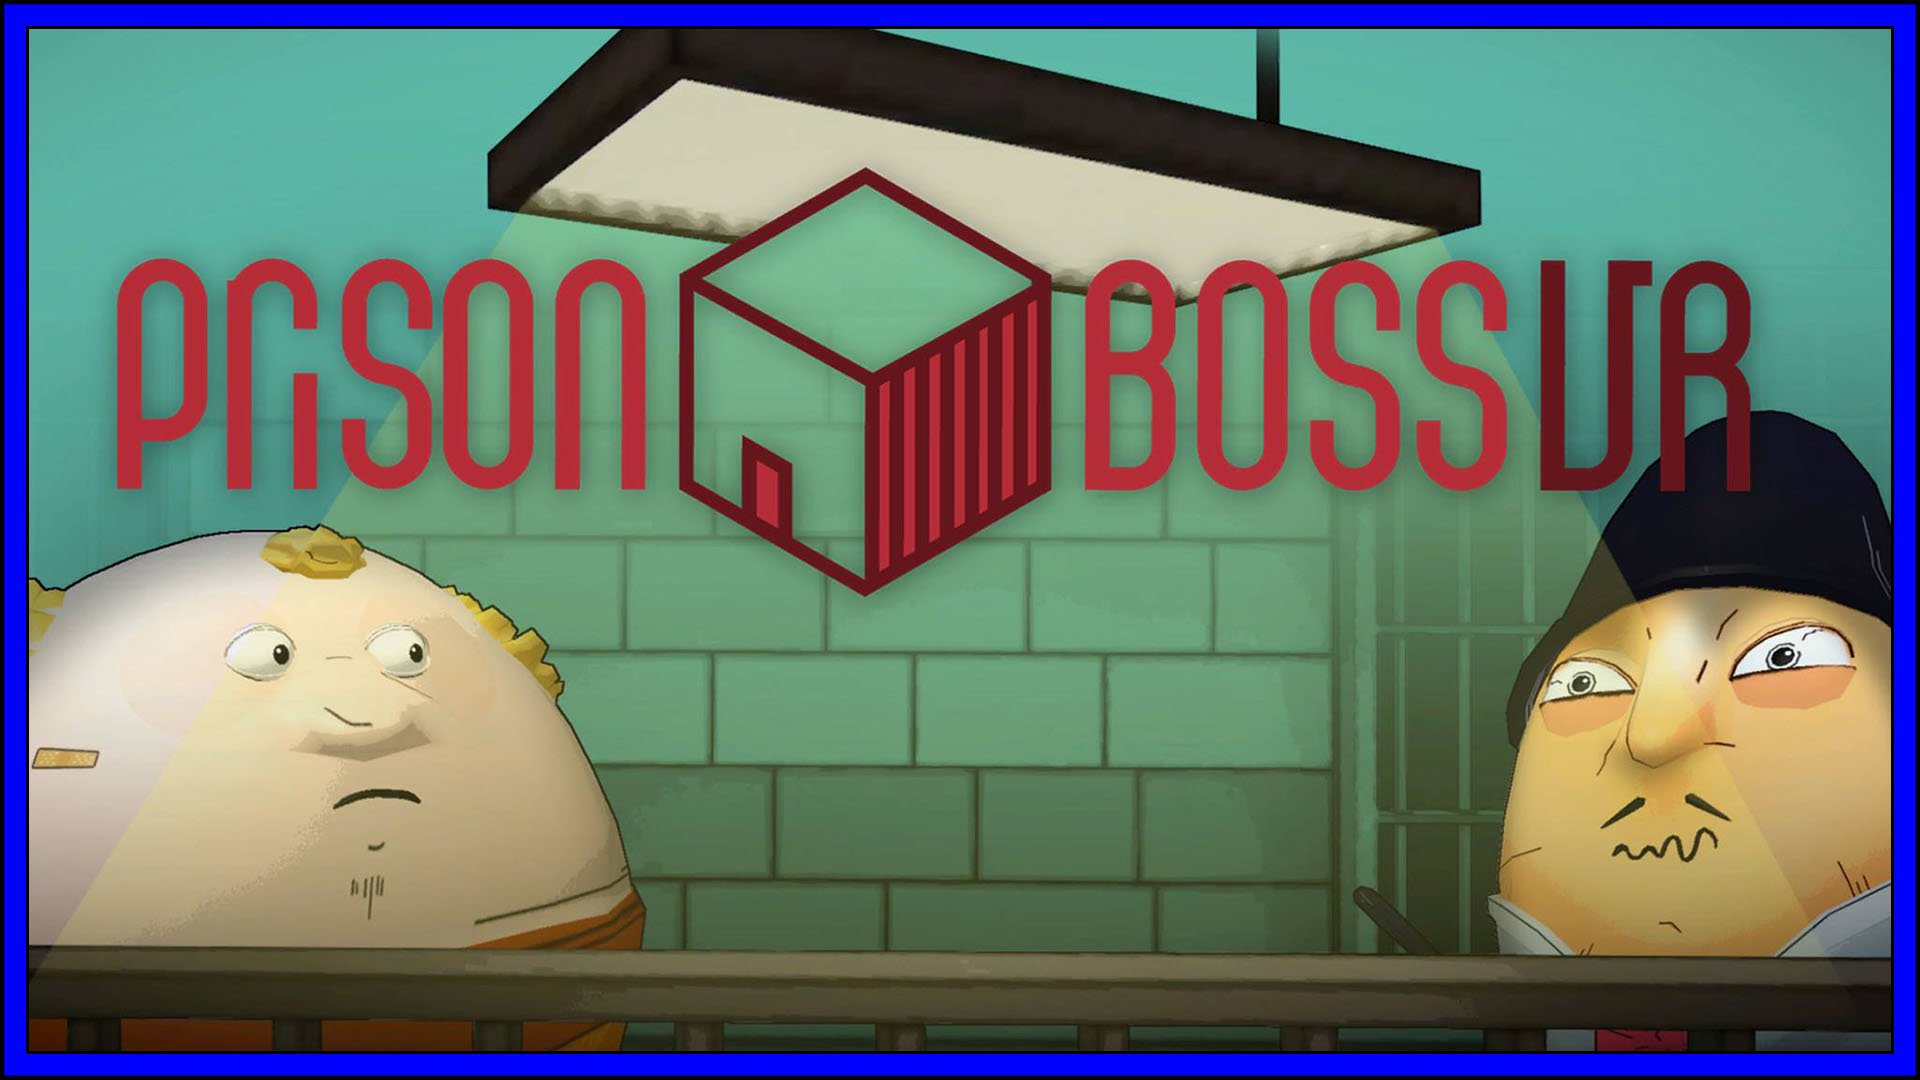 Prison Boss VR Fi3